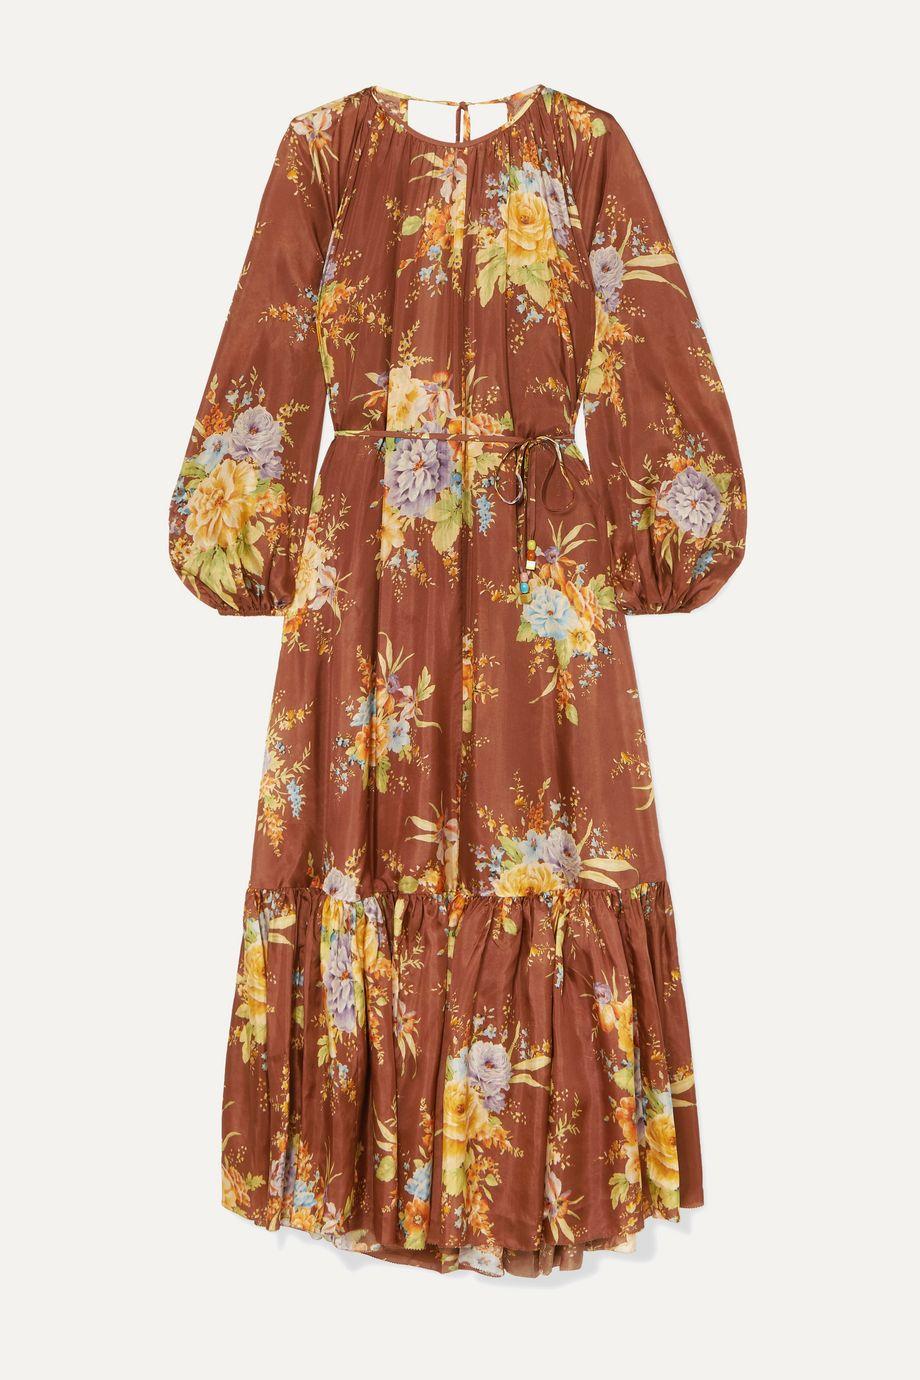 Zimmermann Robe midi dos ouvert en soie à imprimé fleuri Zinnia